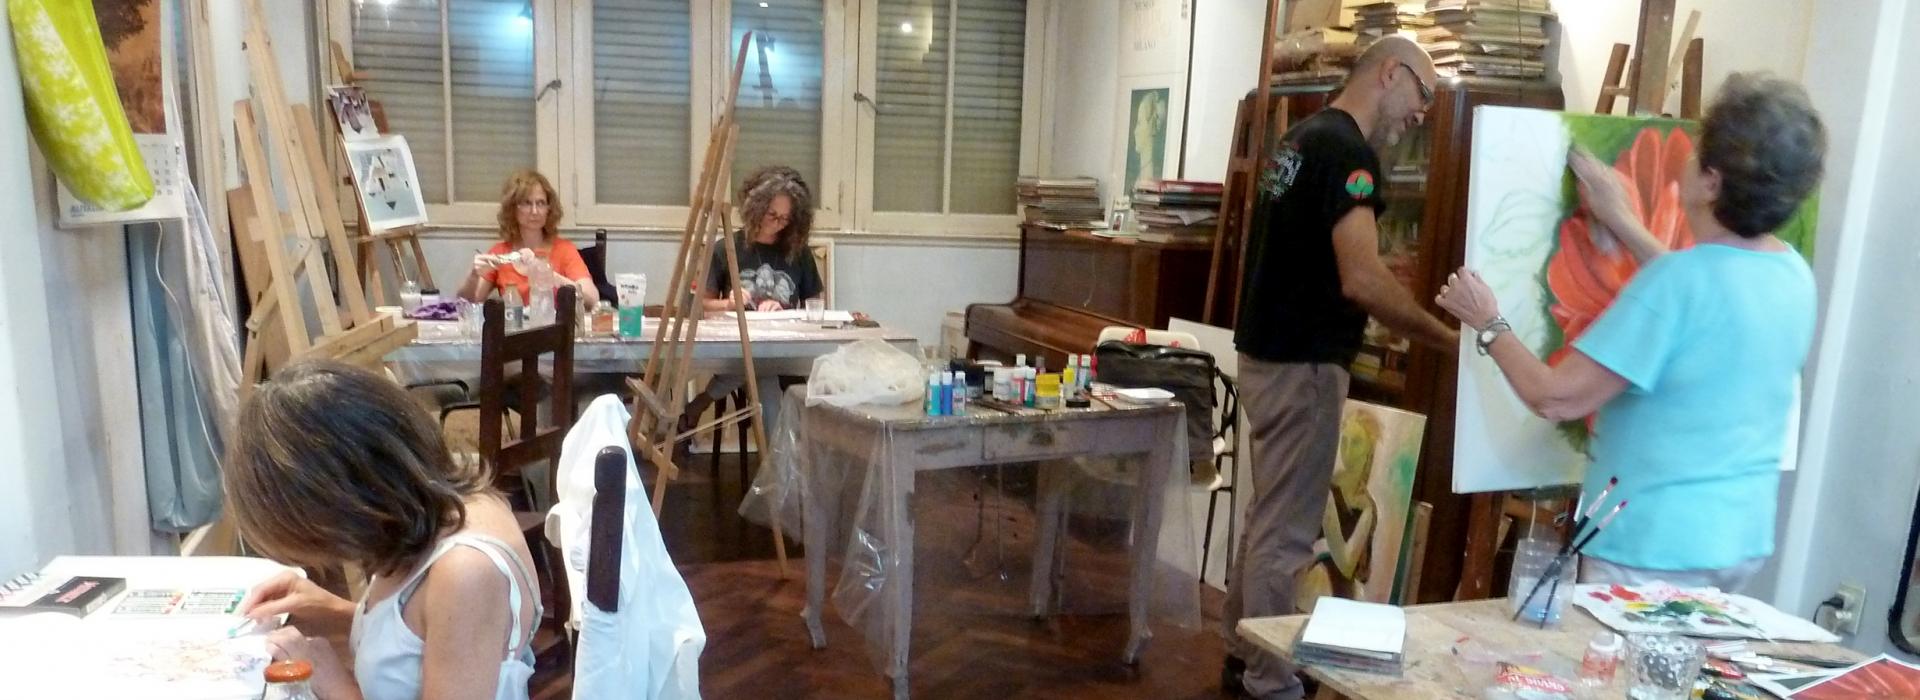 Slide Taller de dibujo y pintura